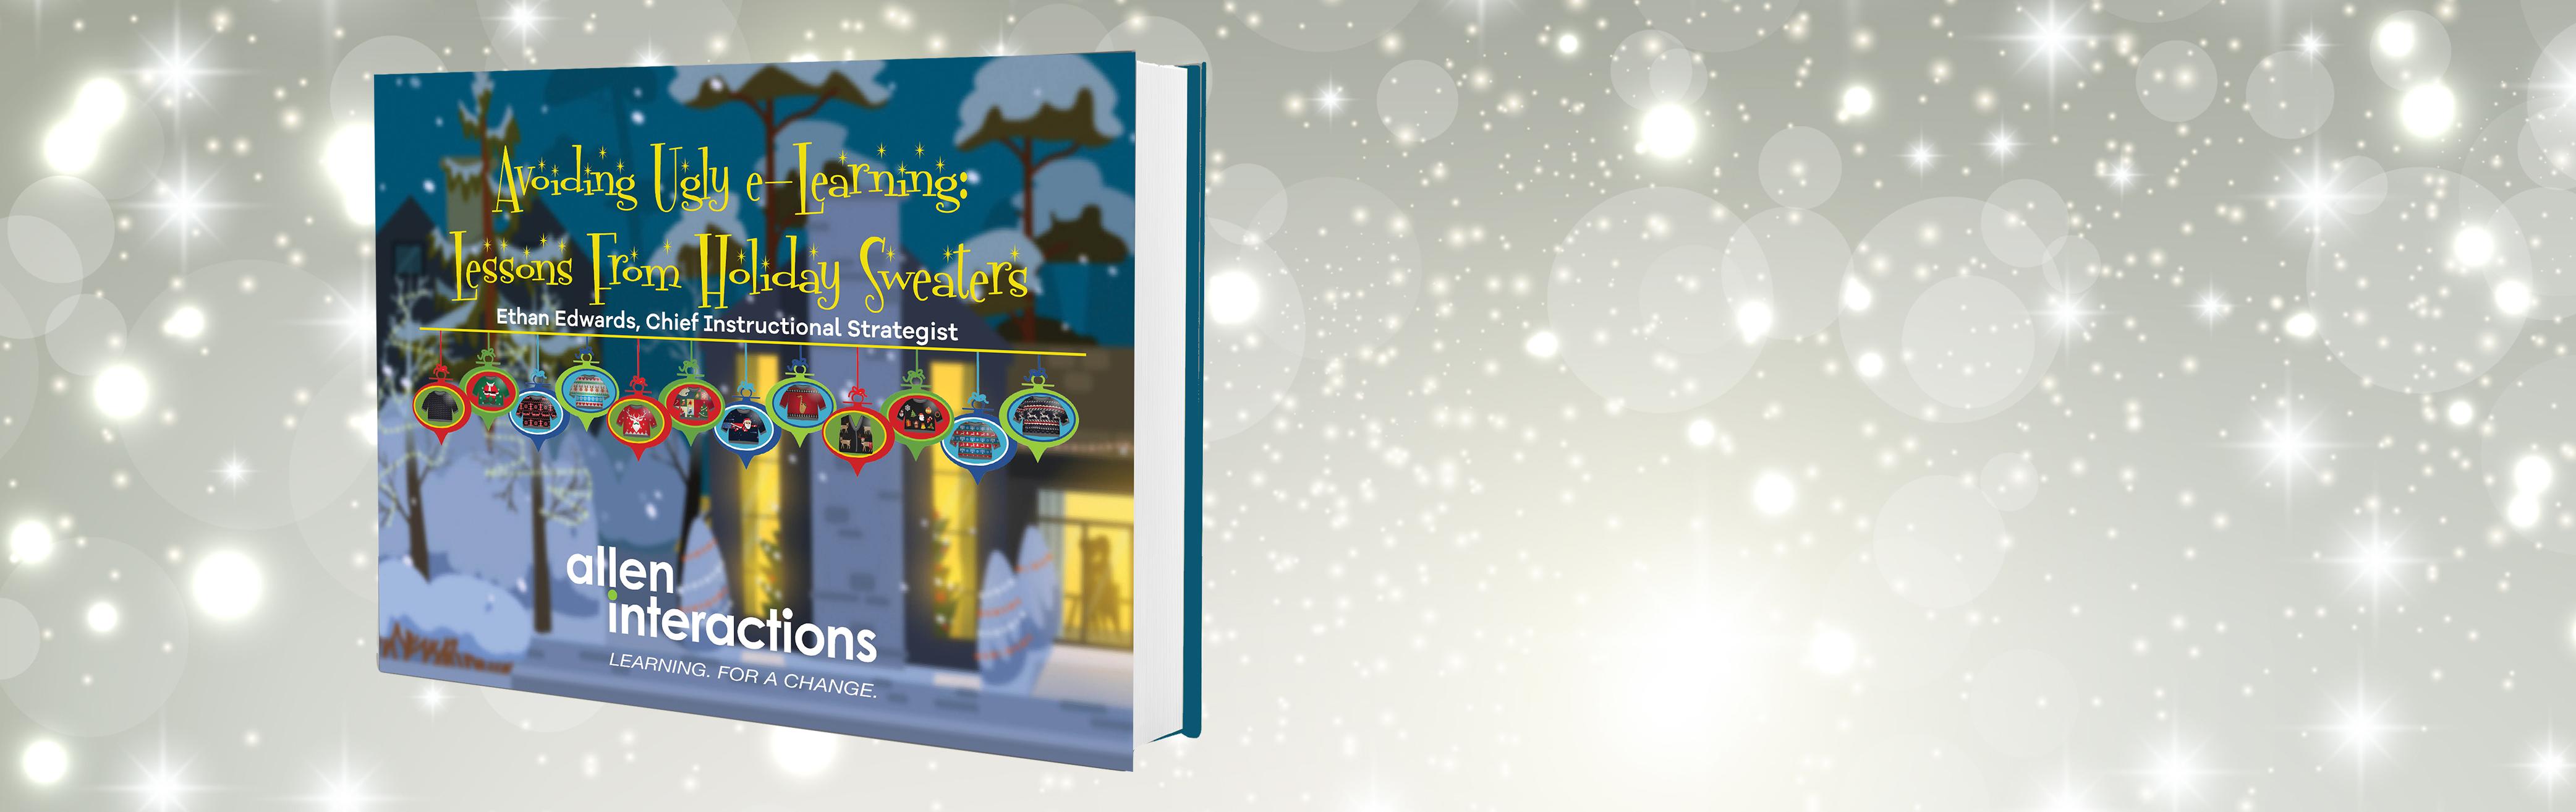 christmas_avoiding_uglyelearning_banner.png